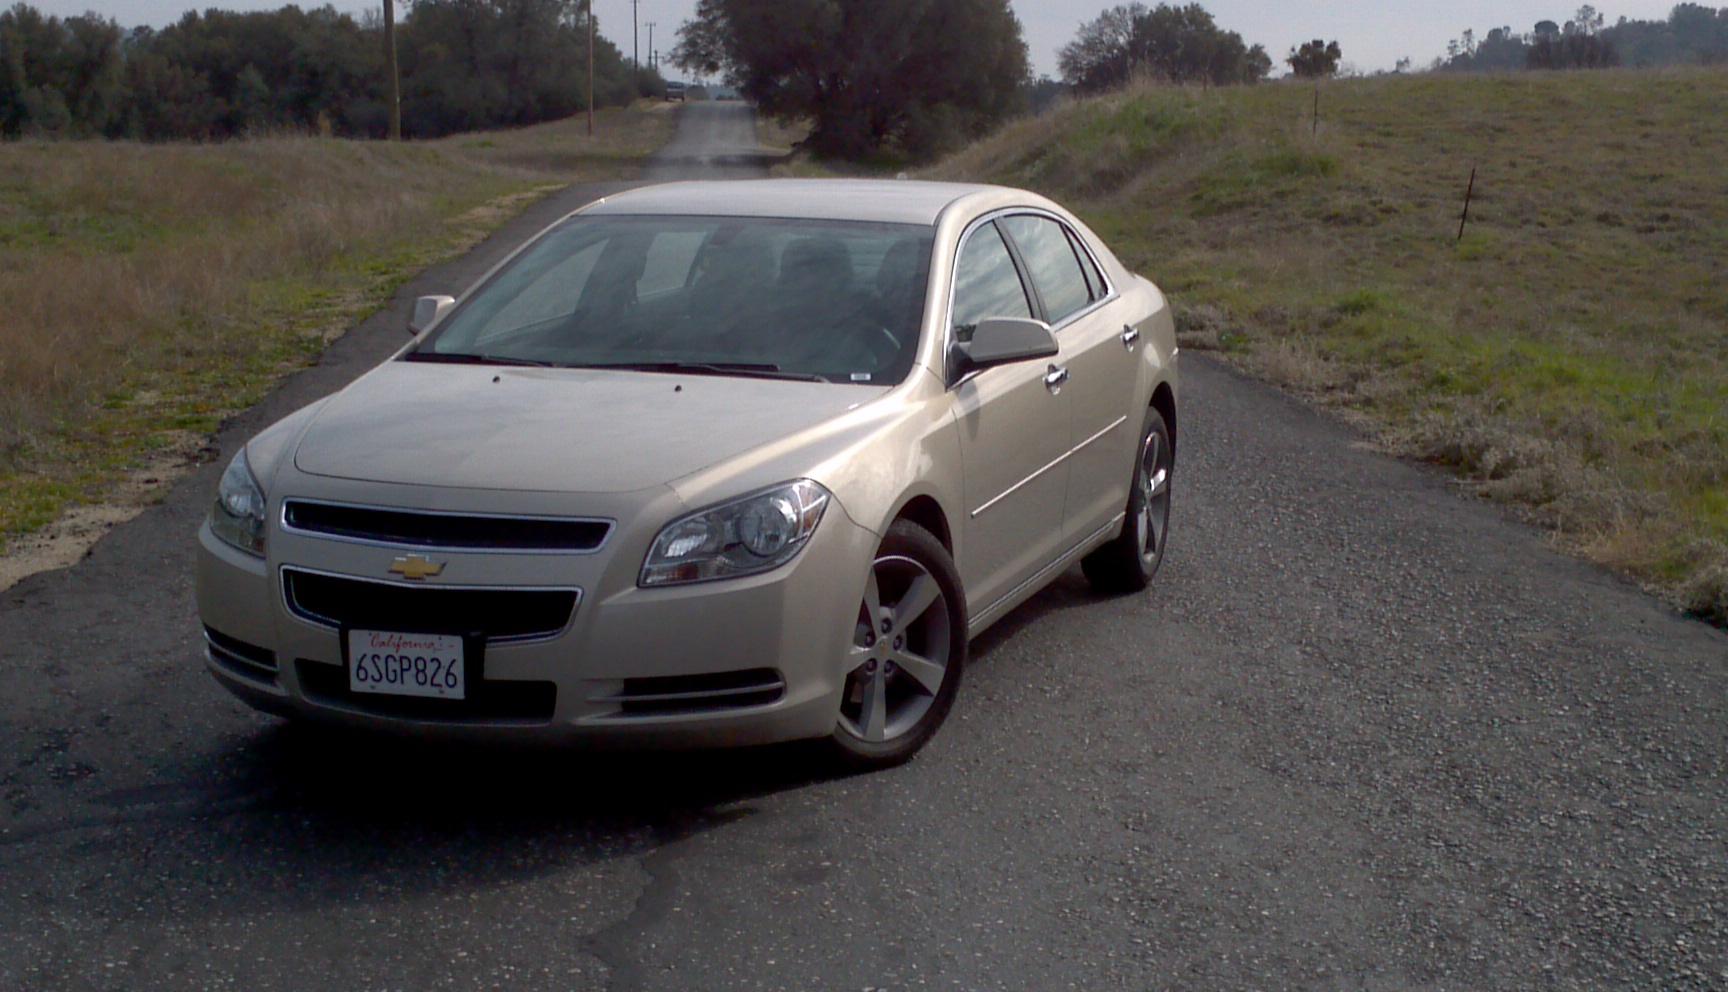 2012 Chevrolet Malibu- Finally, A Car That's Found Its ...